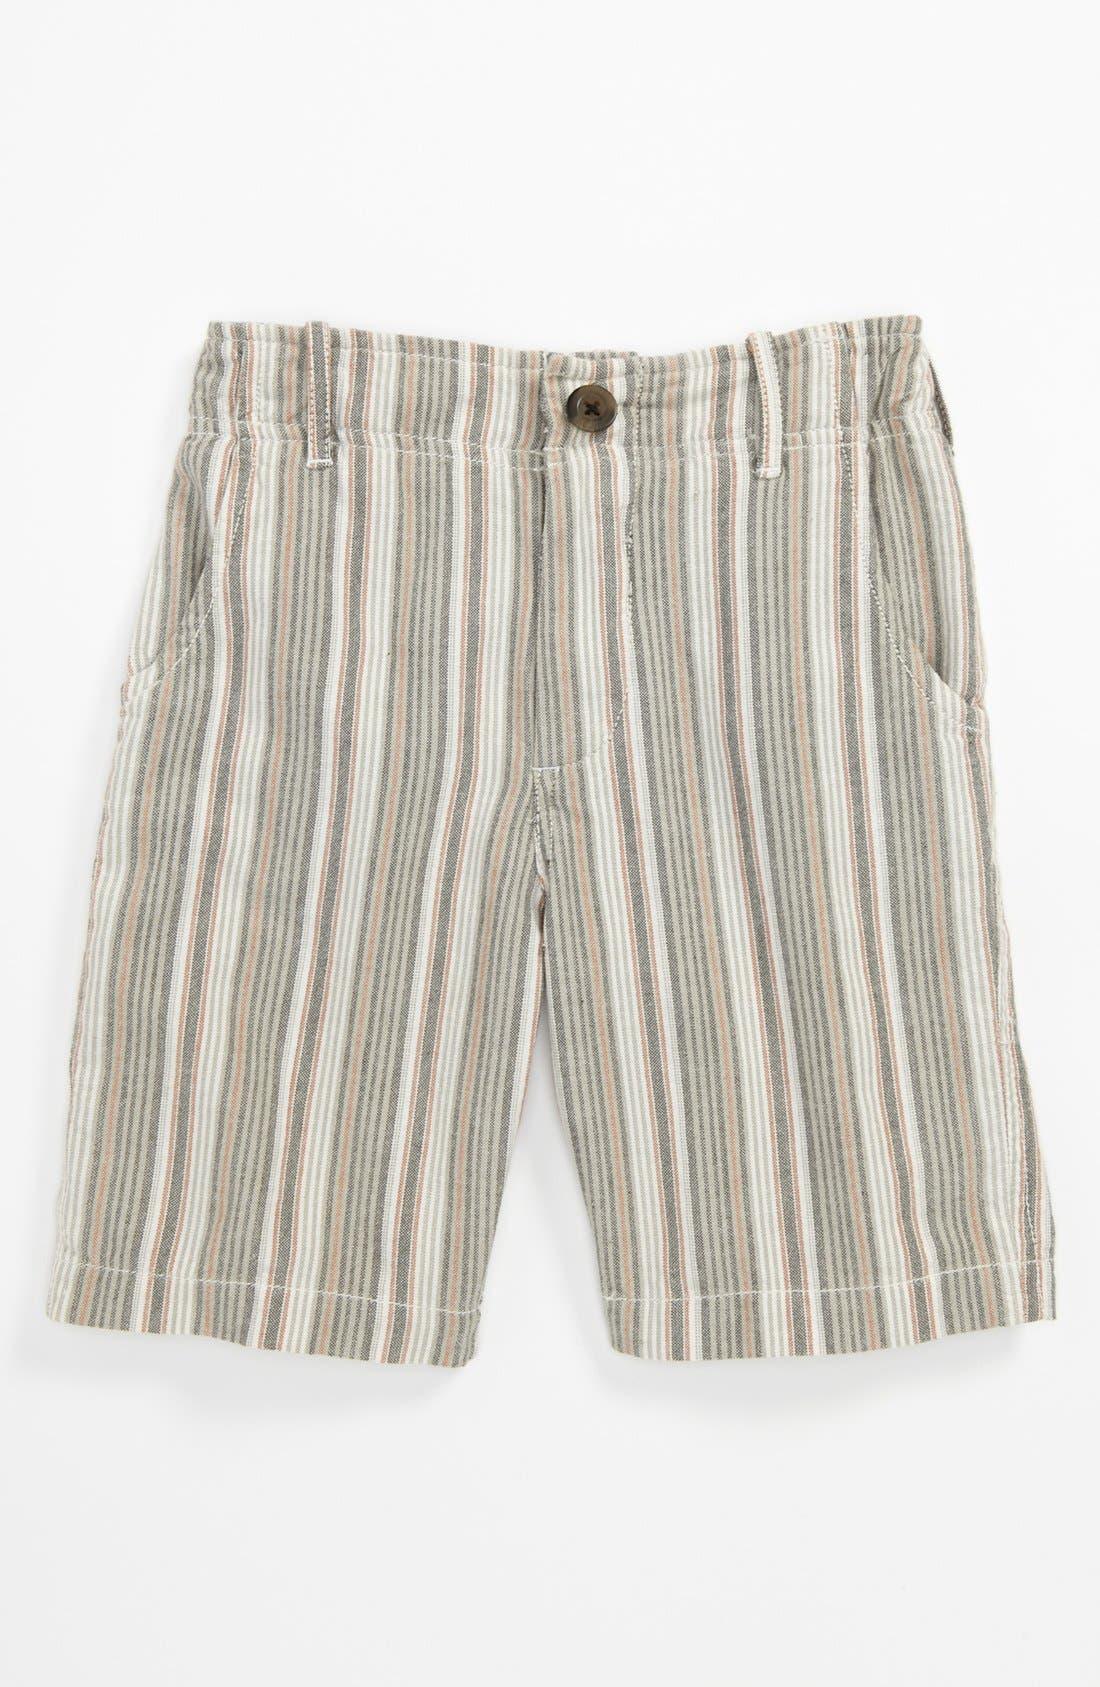 Alternate Image 1 Selected - Peek 'Benito' Stripe Shorts (Big Boys)